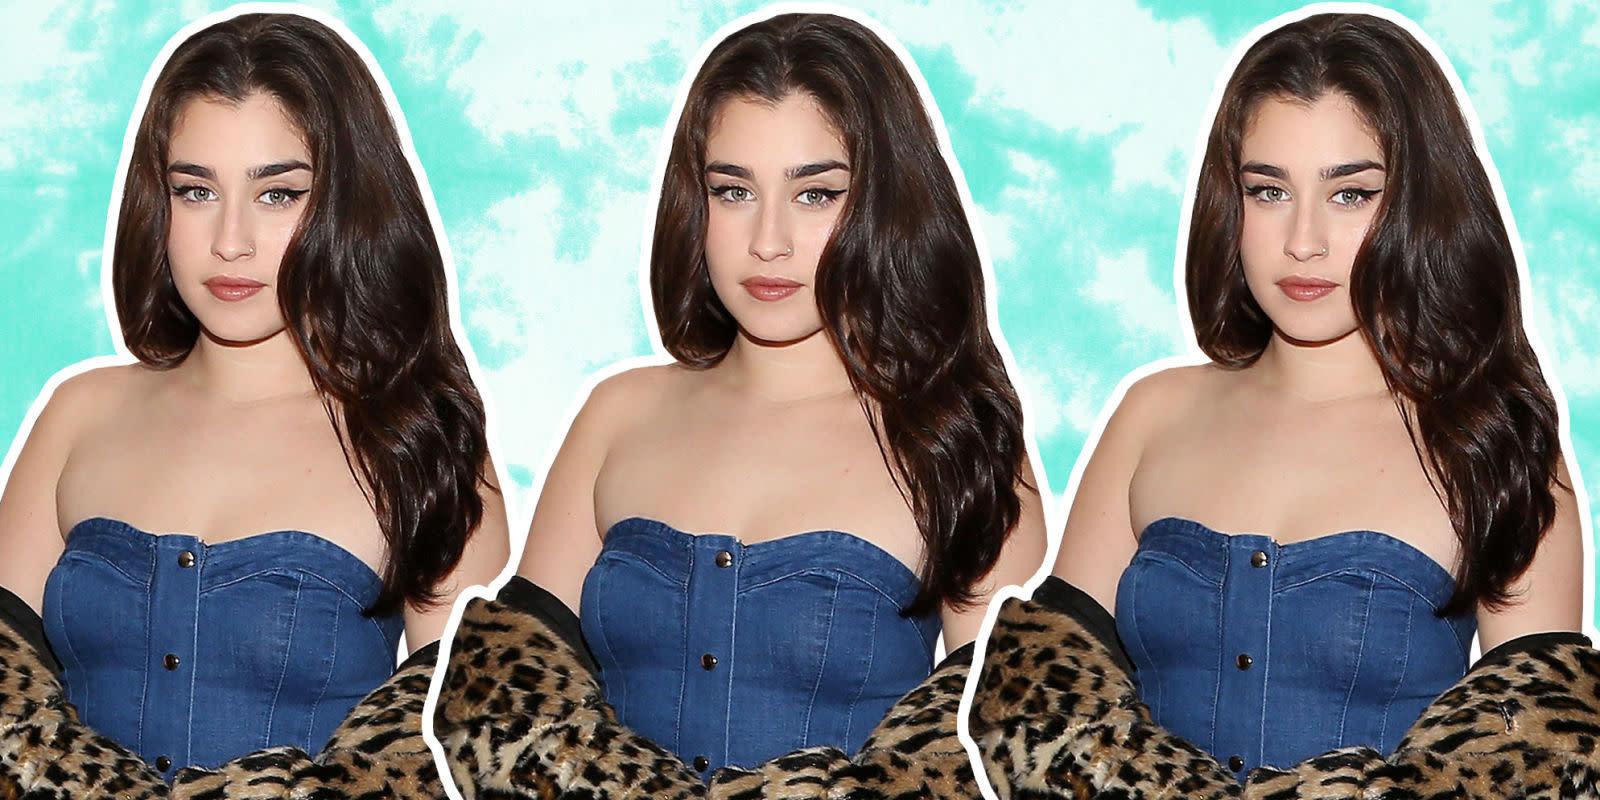 Lauren Jauregui Missed a Fifth Harmony Show After Getting